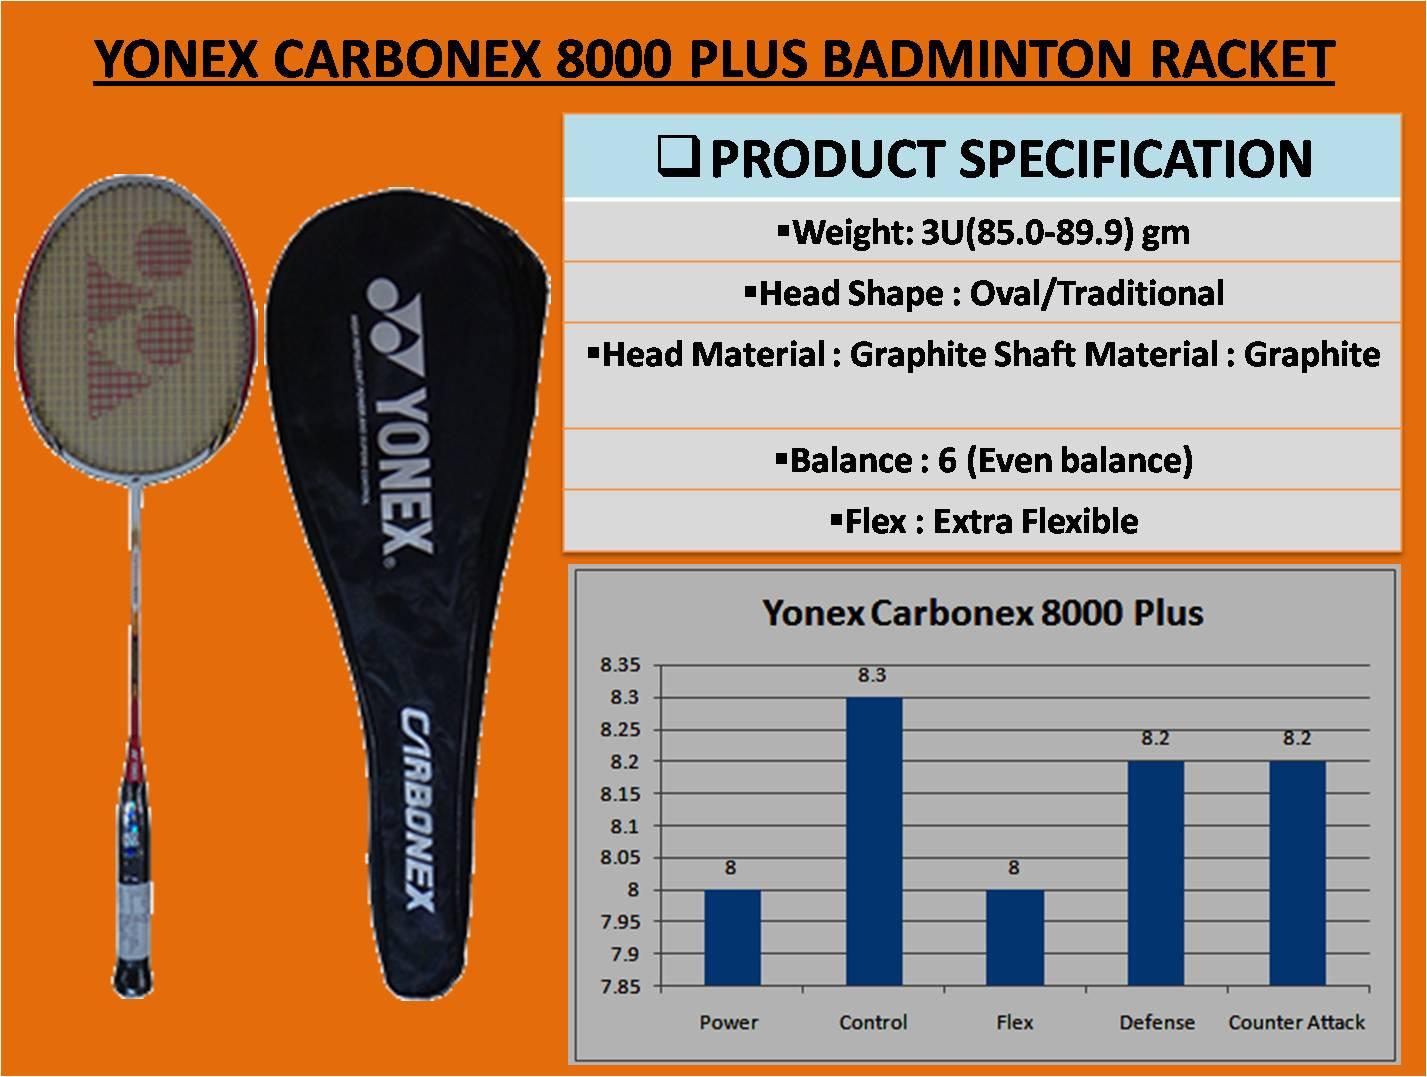 YONEX CARBONEX 8000 PLUS BADMINTON RACKET_4